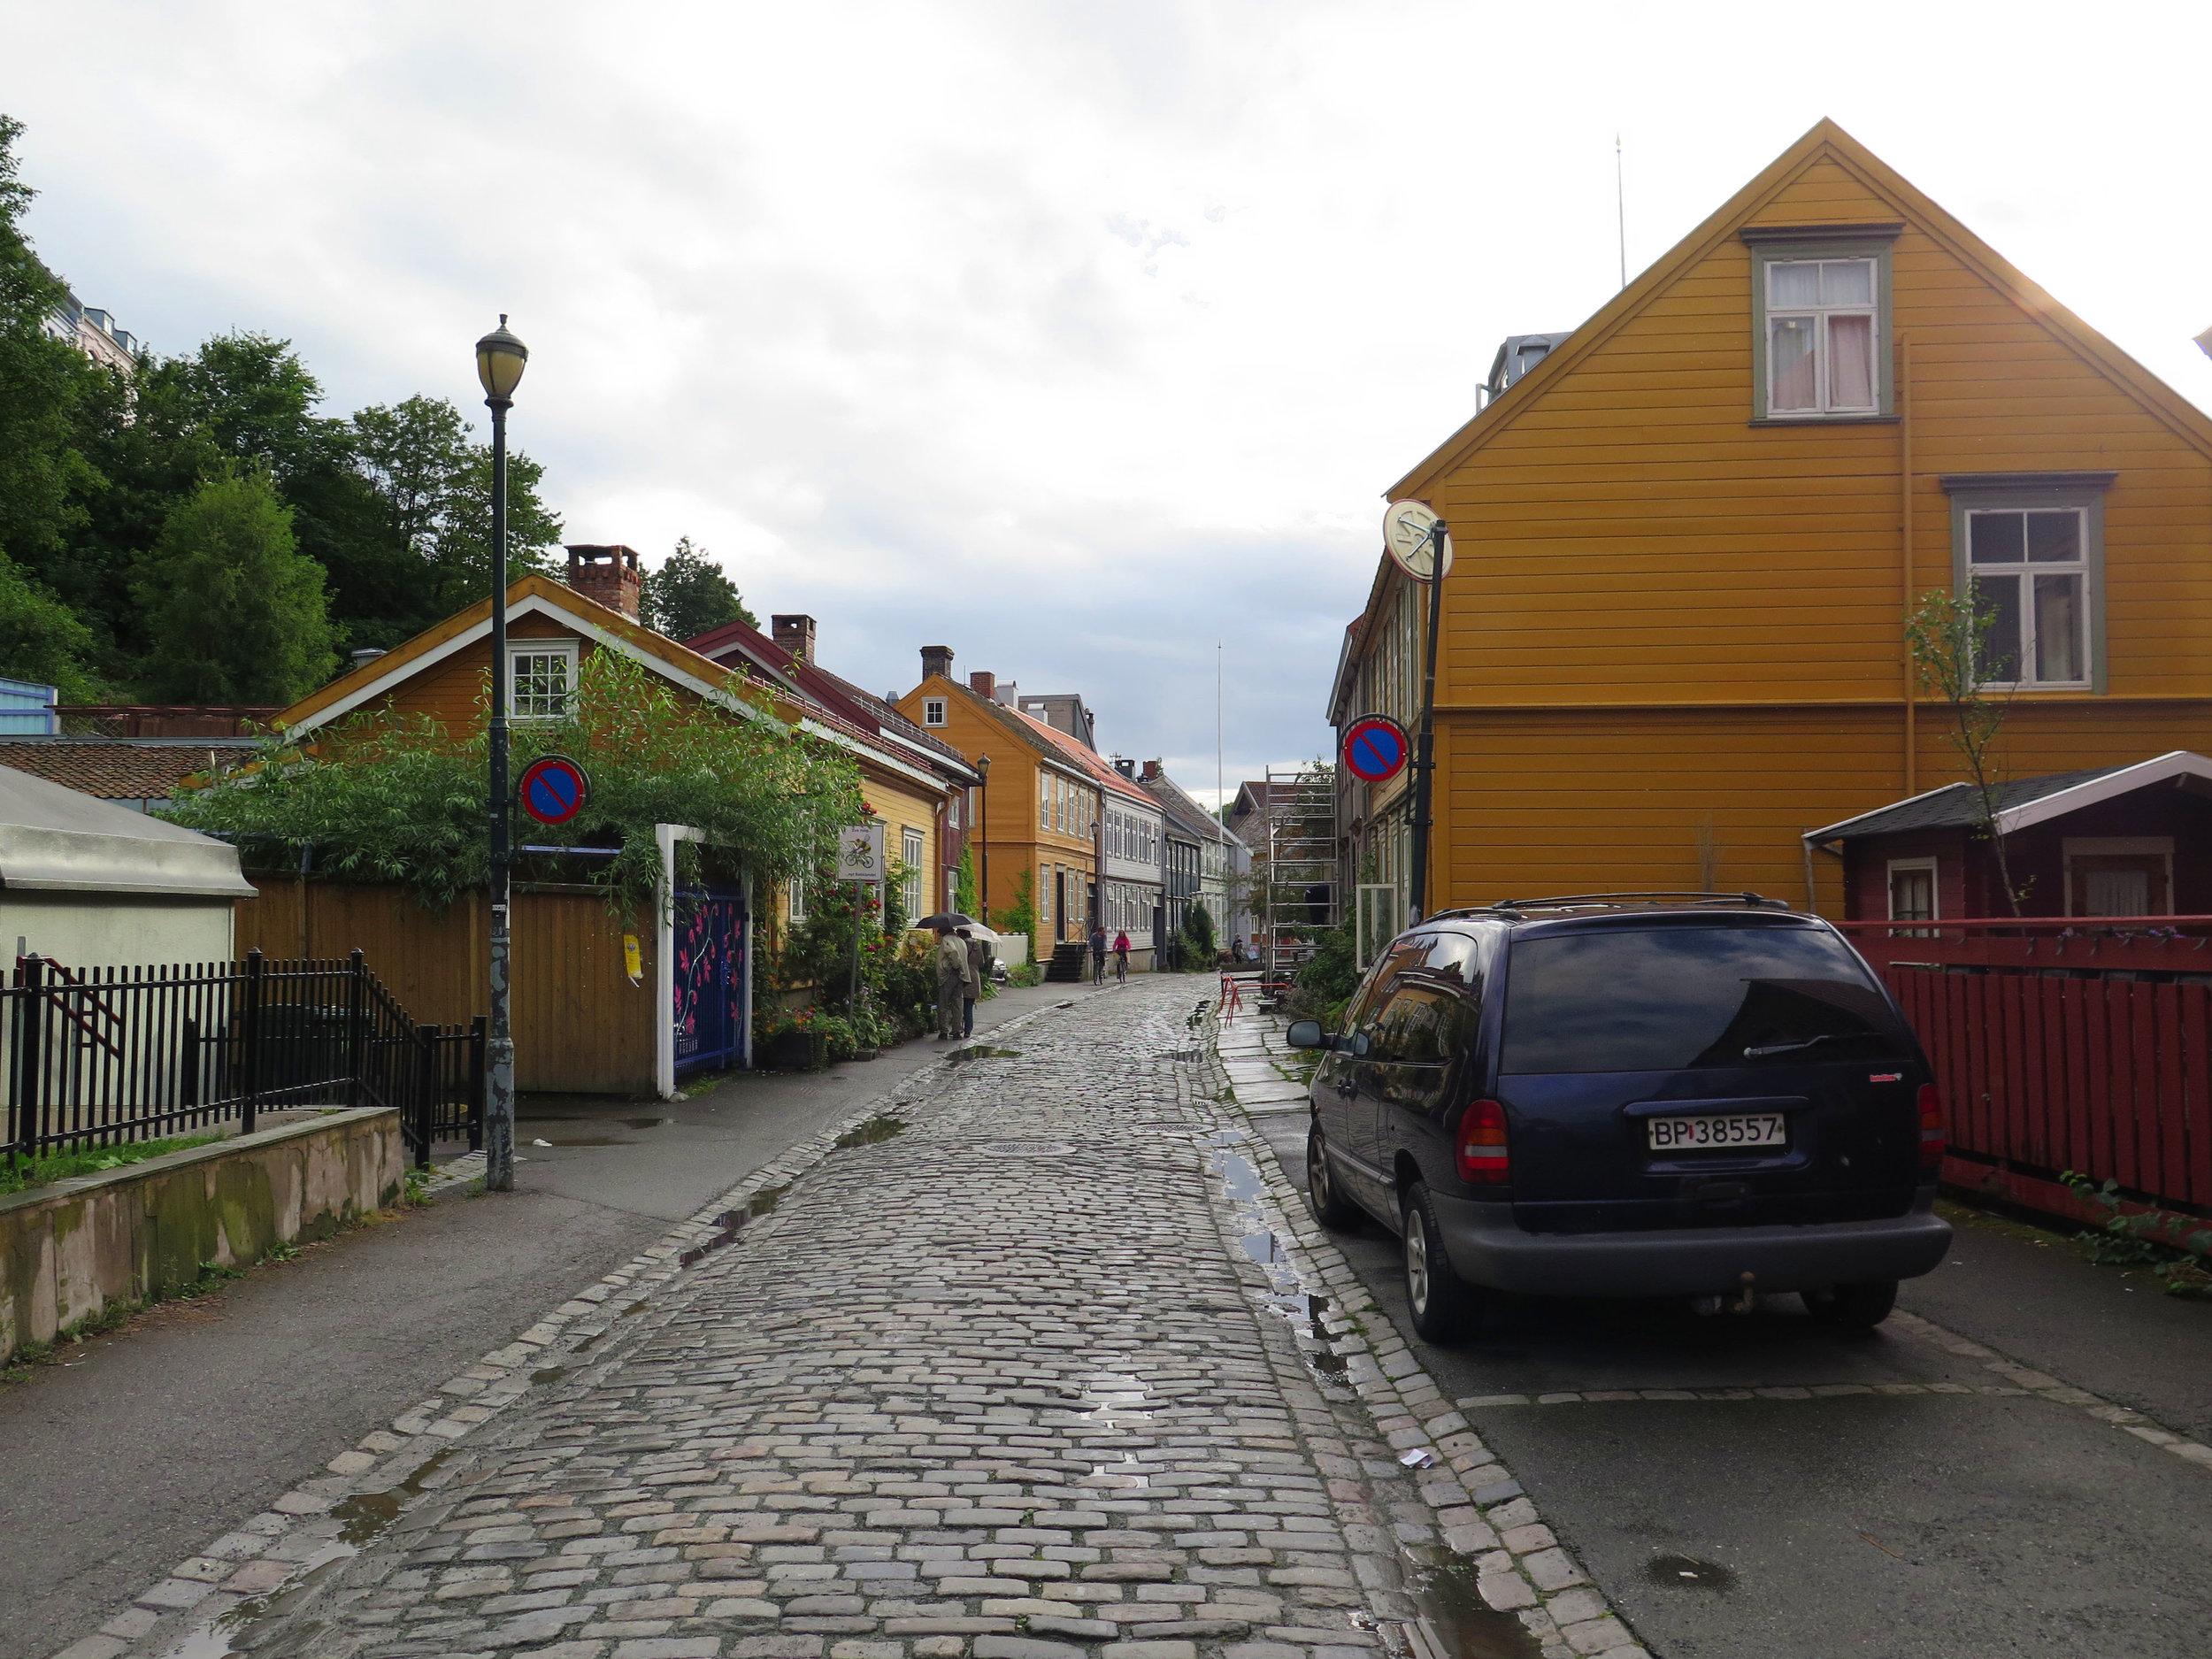 backstreets of Trondheim